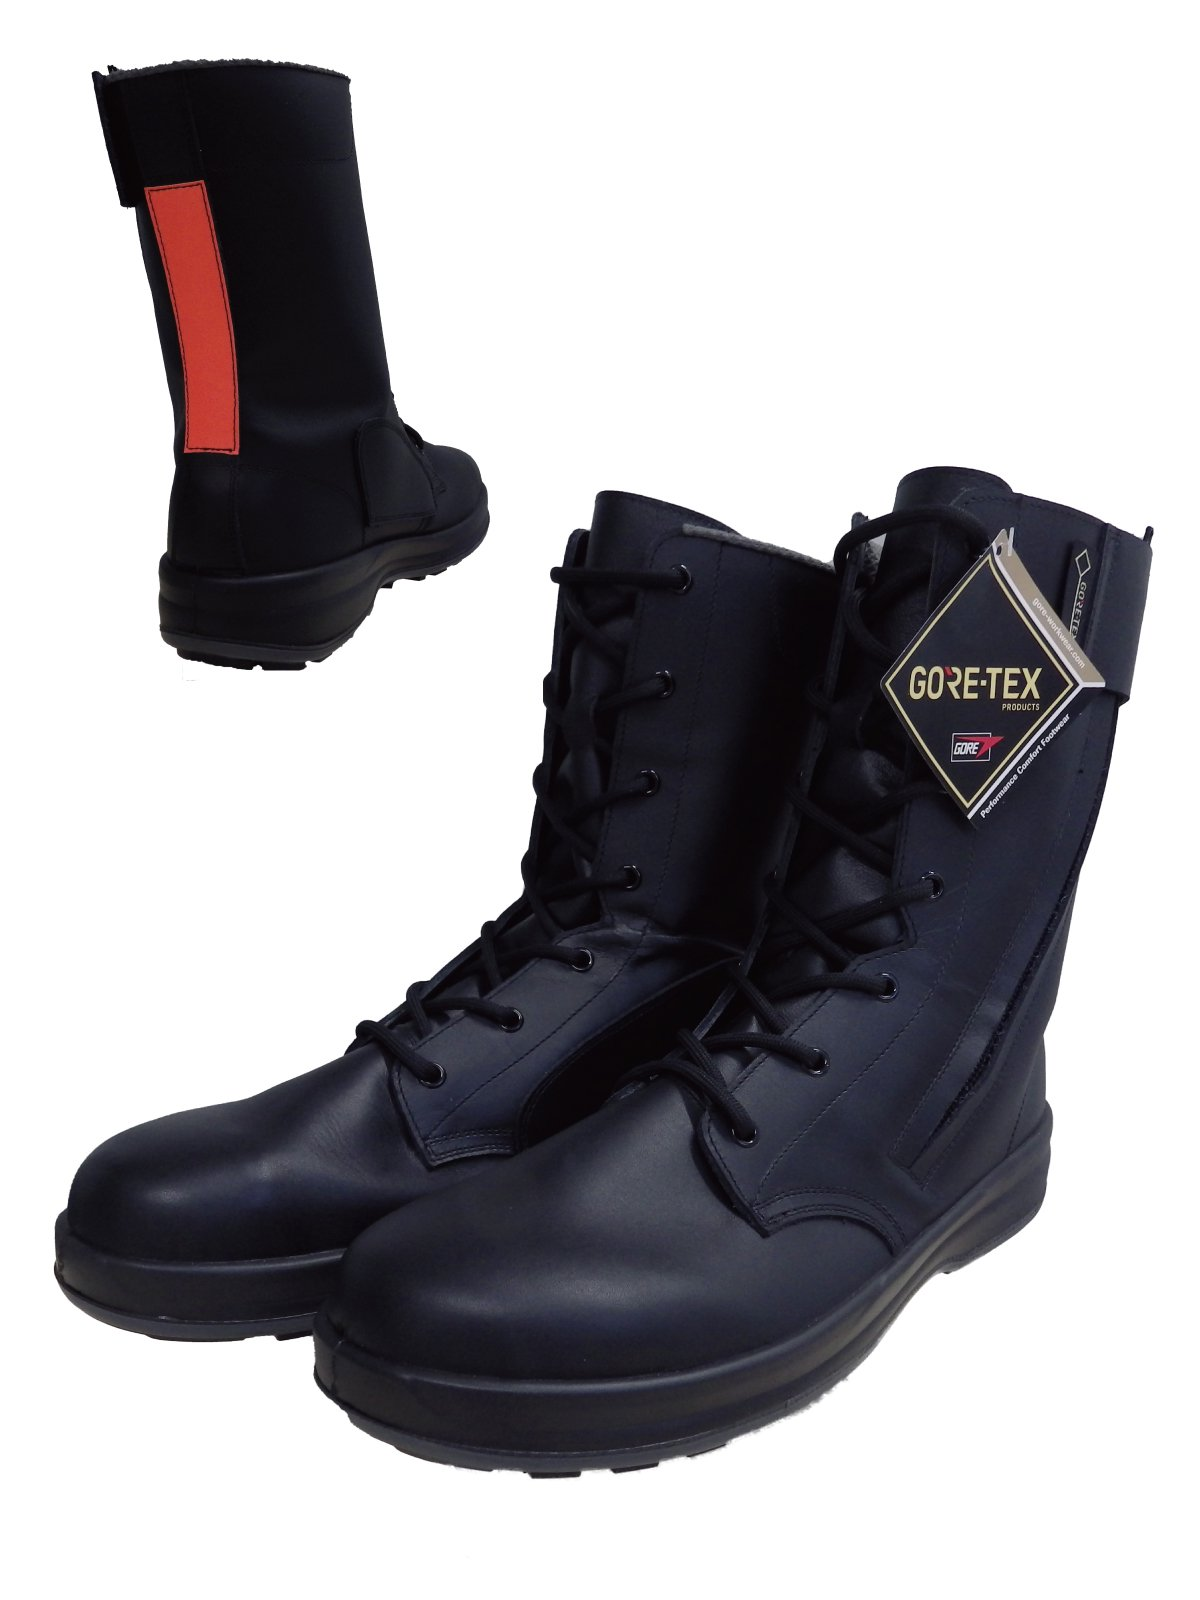 GORE-TEX 編上活動靴 WS33HiFR